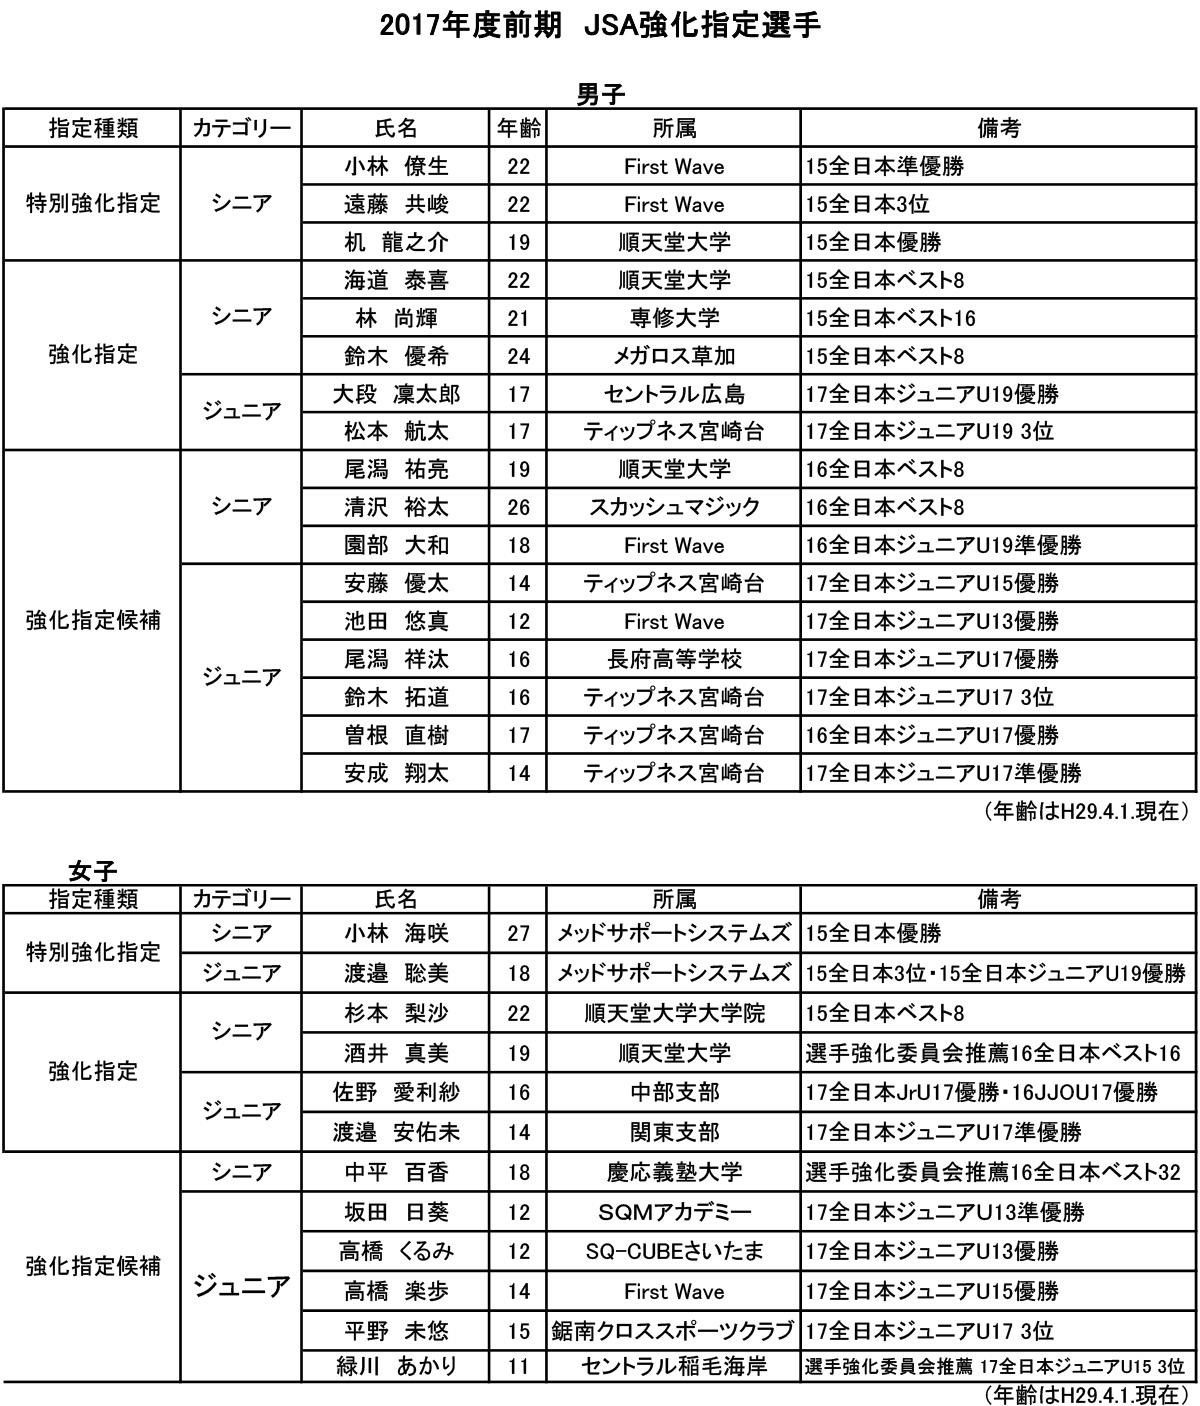 jsa_170501_national_2017zenki_kyoka-3